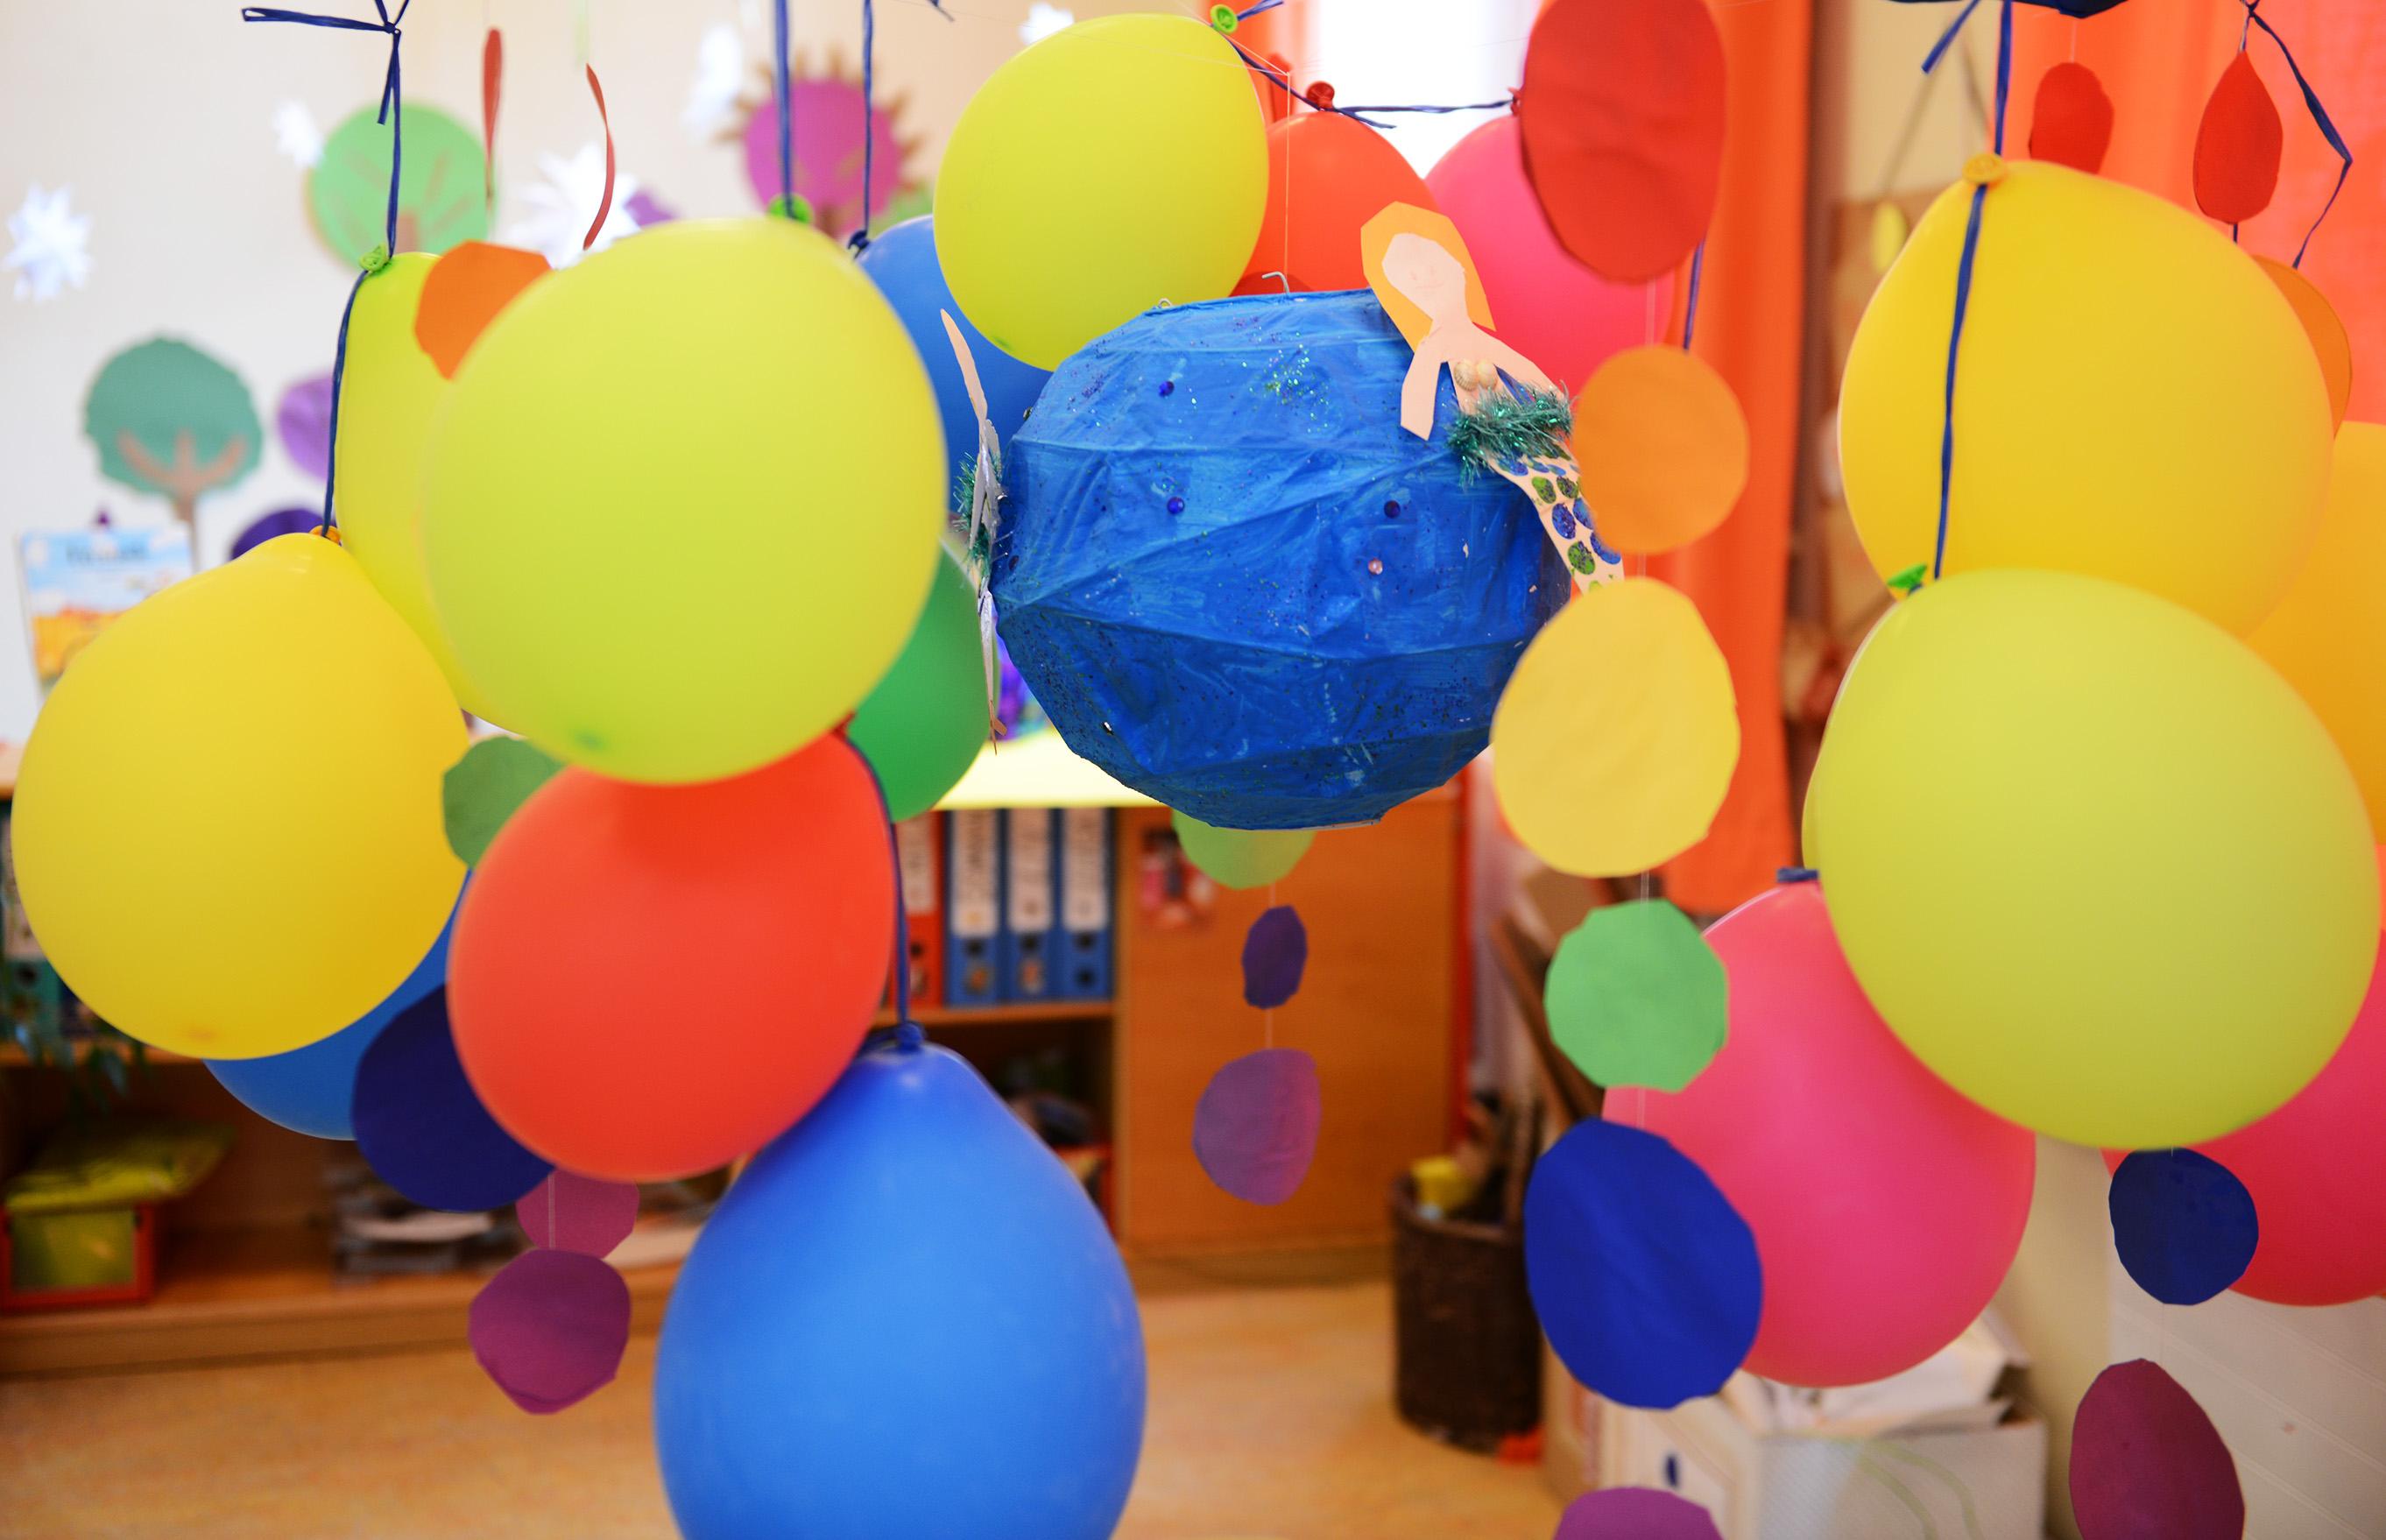 Foto: Luftballons